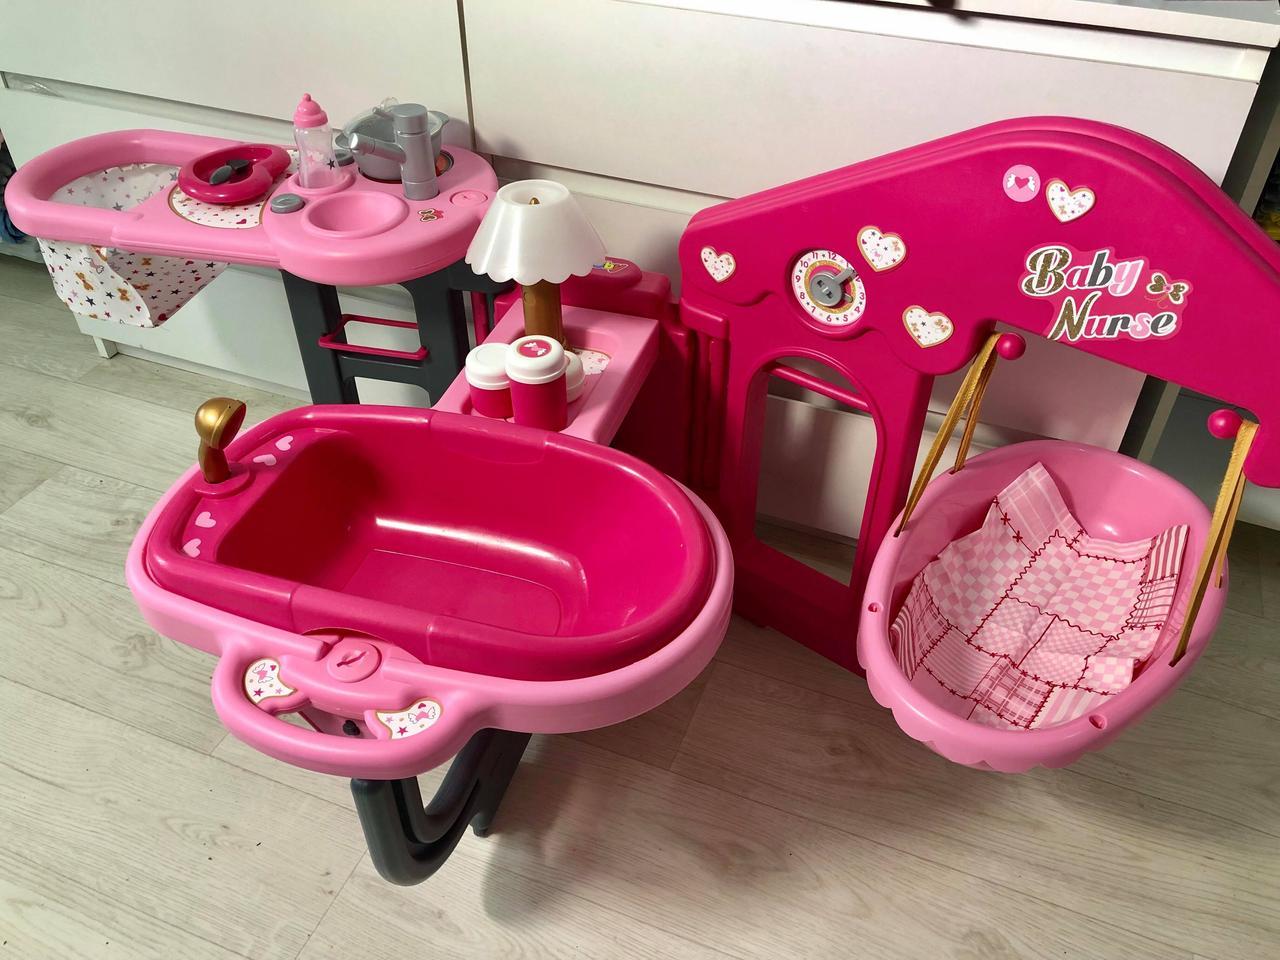 Кімната по догляду за пупсом Baby Nurse